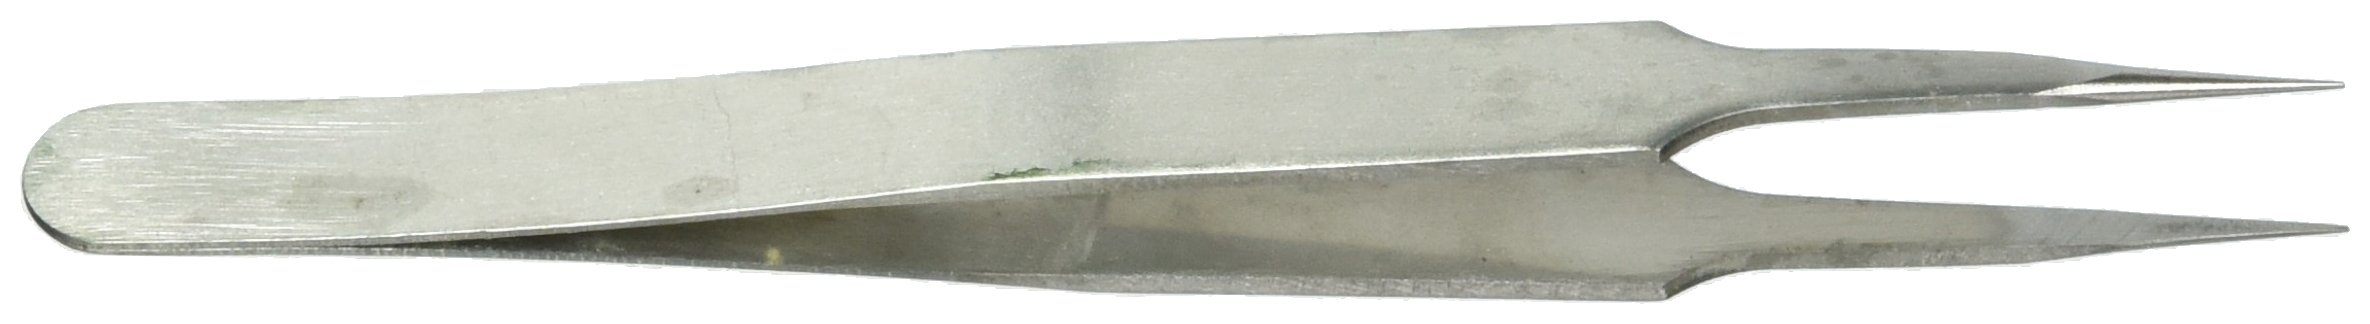 uxcell Picking Metal Pointed Tip Tweezer Nipper 5'' Long